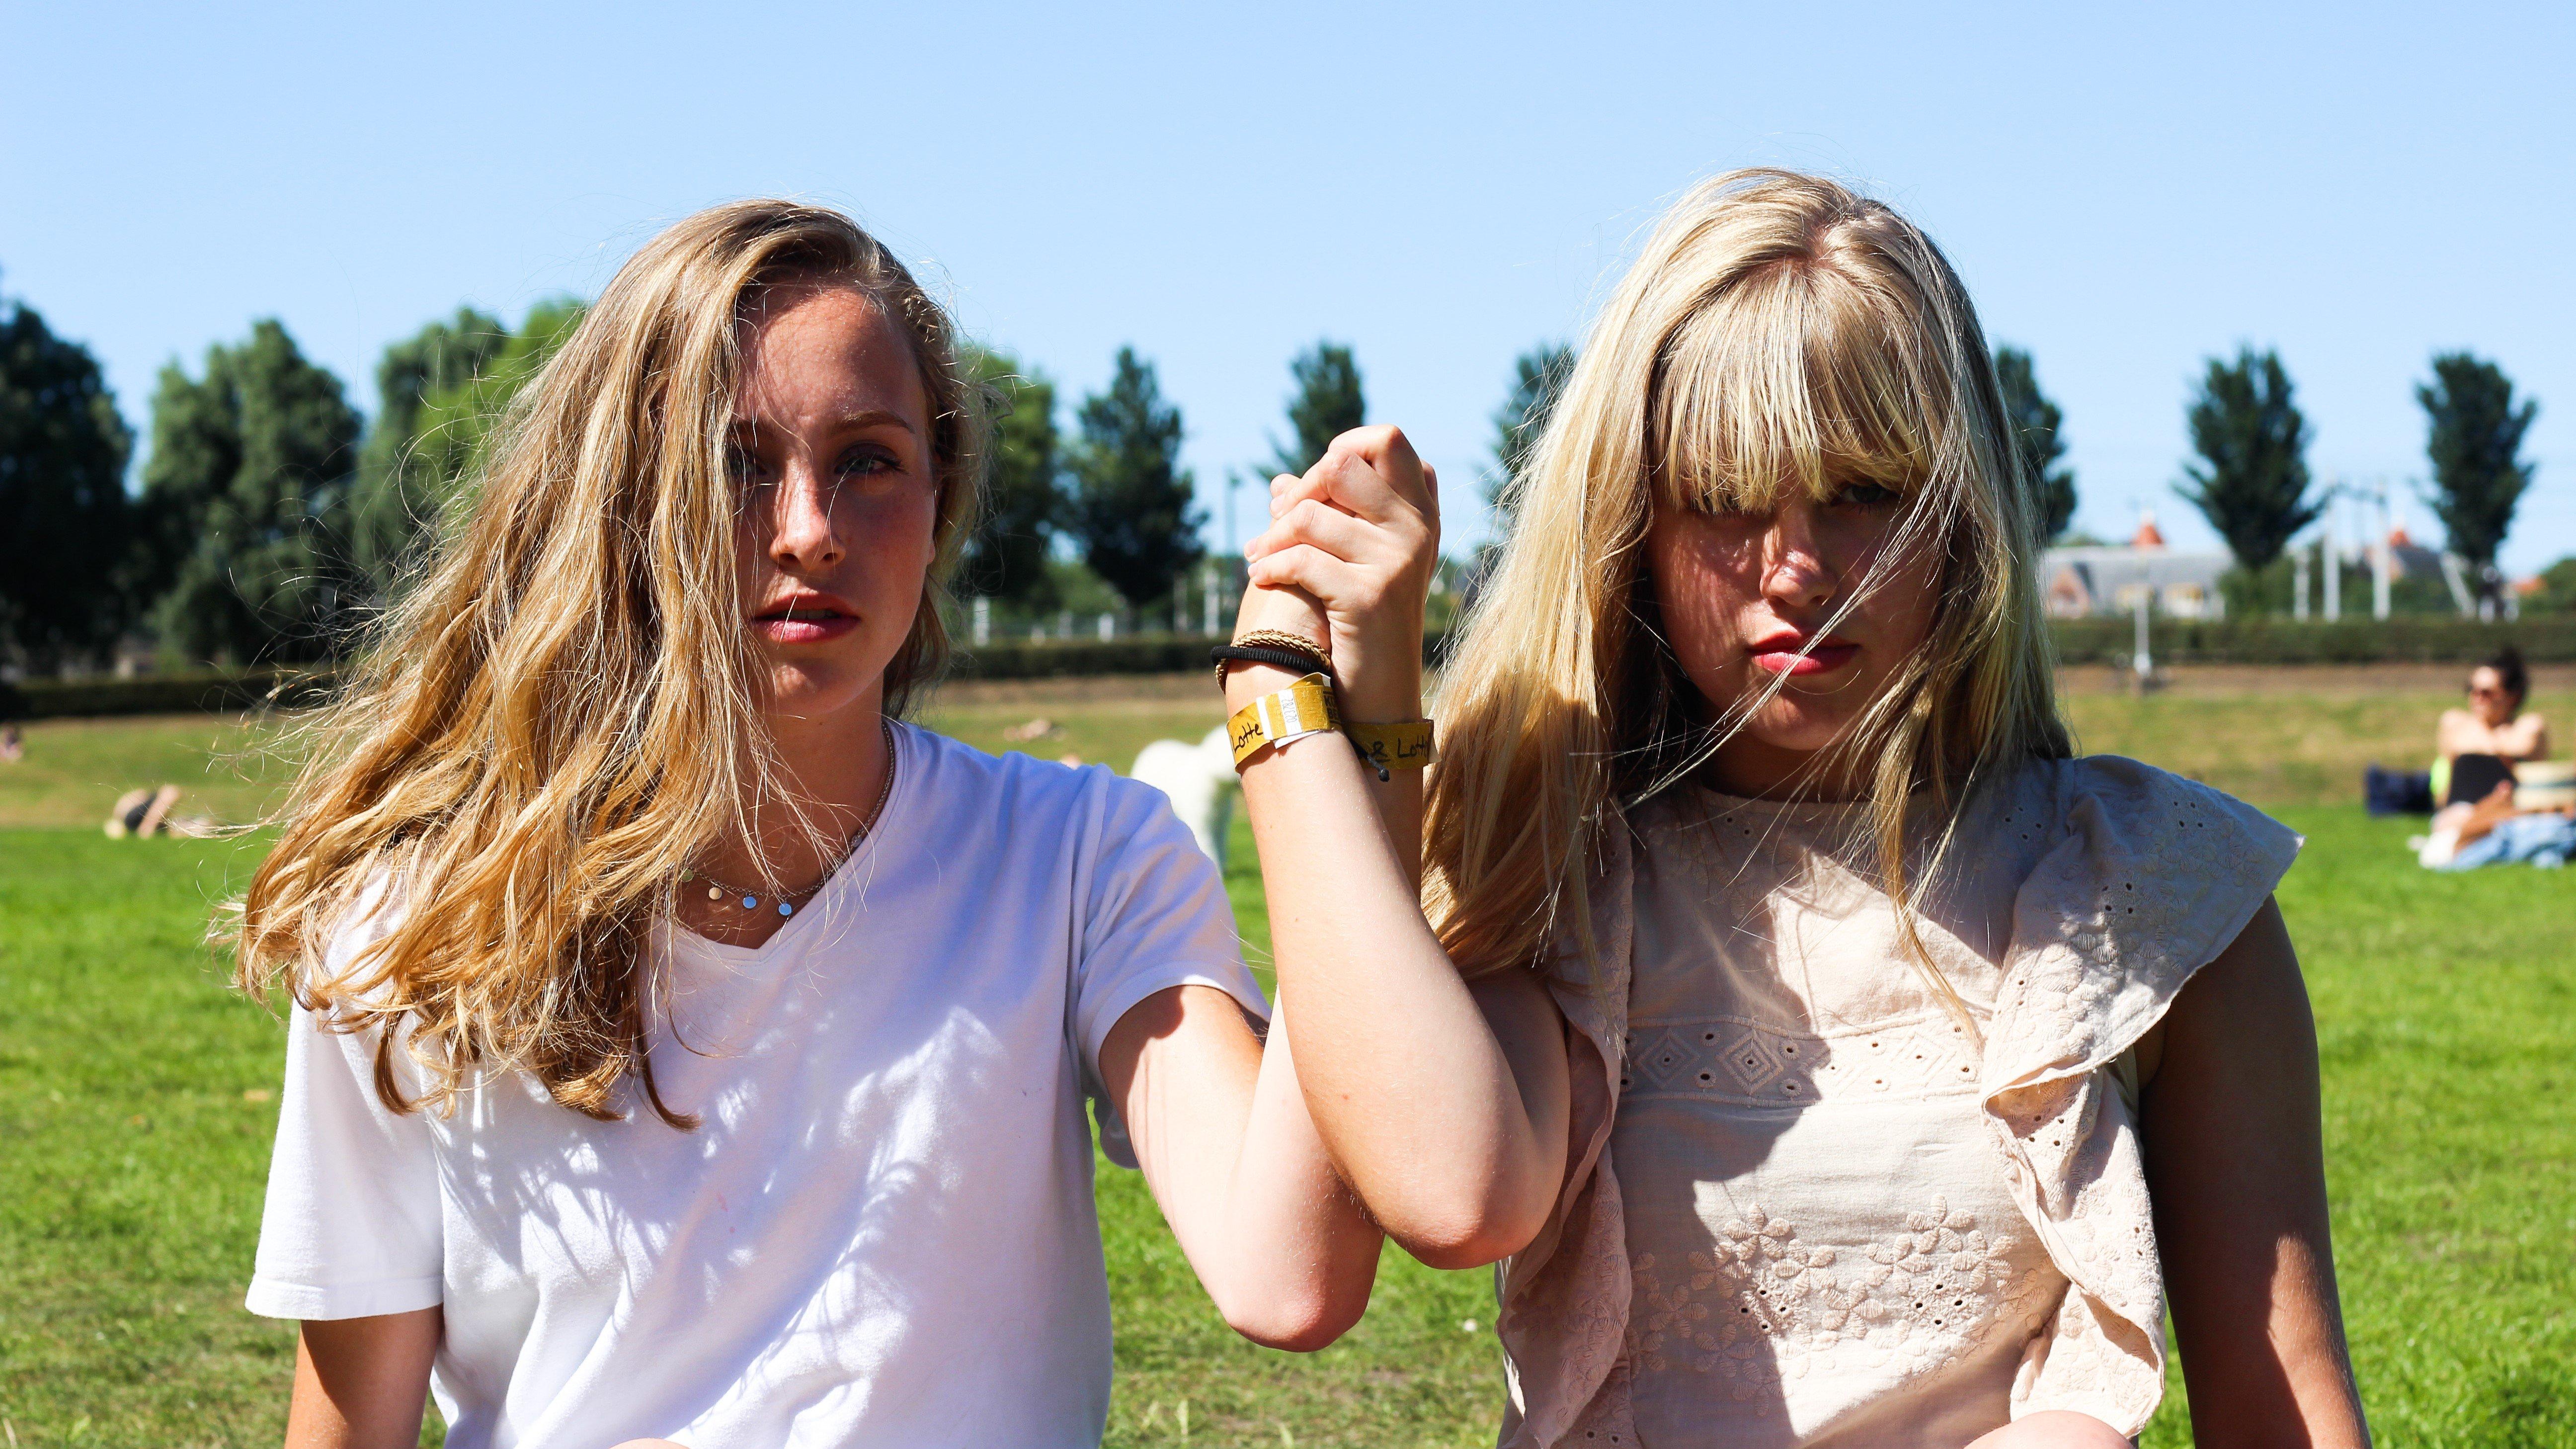 Iris(l) en Lotte(r). Beeld: Elisa Lo-A-Njoe.